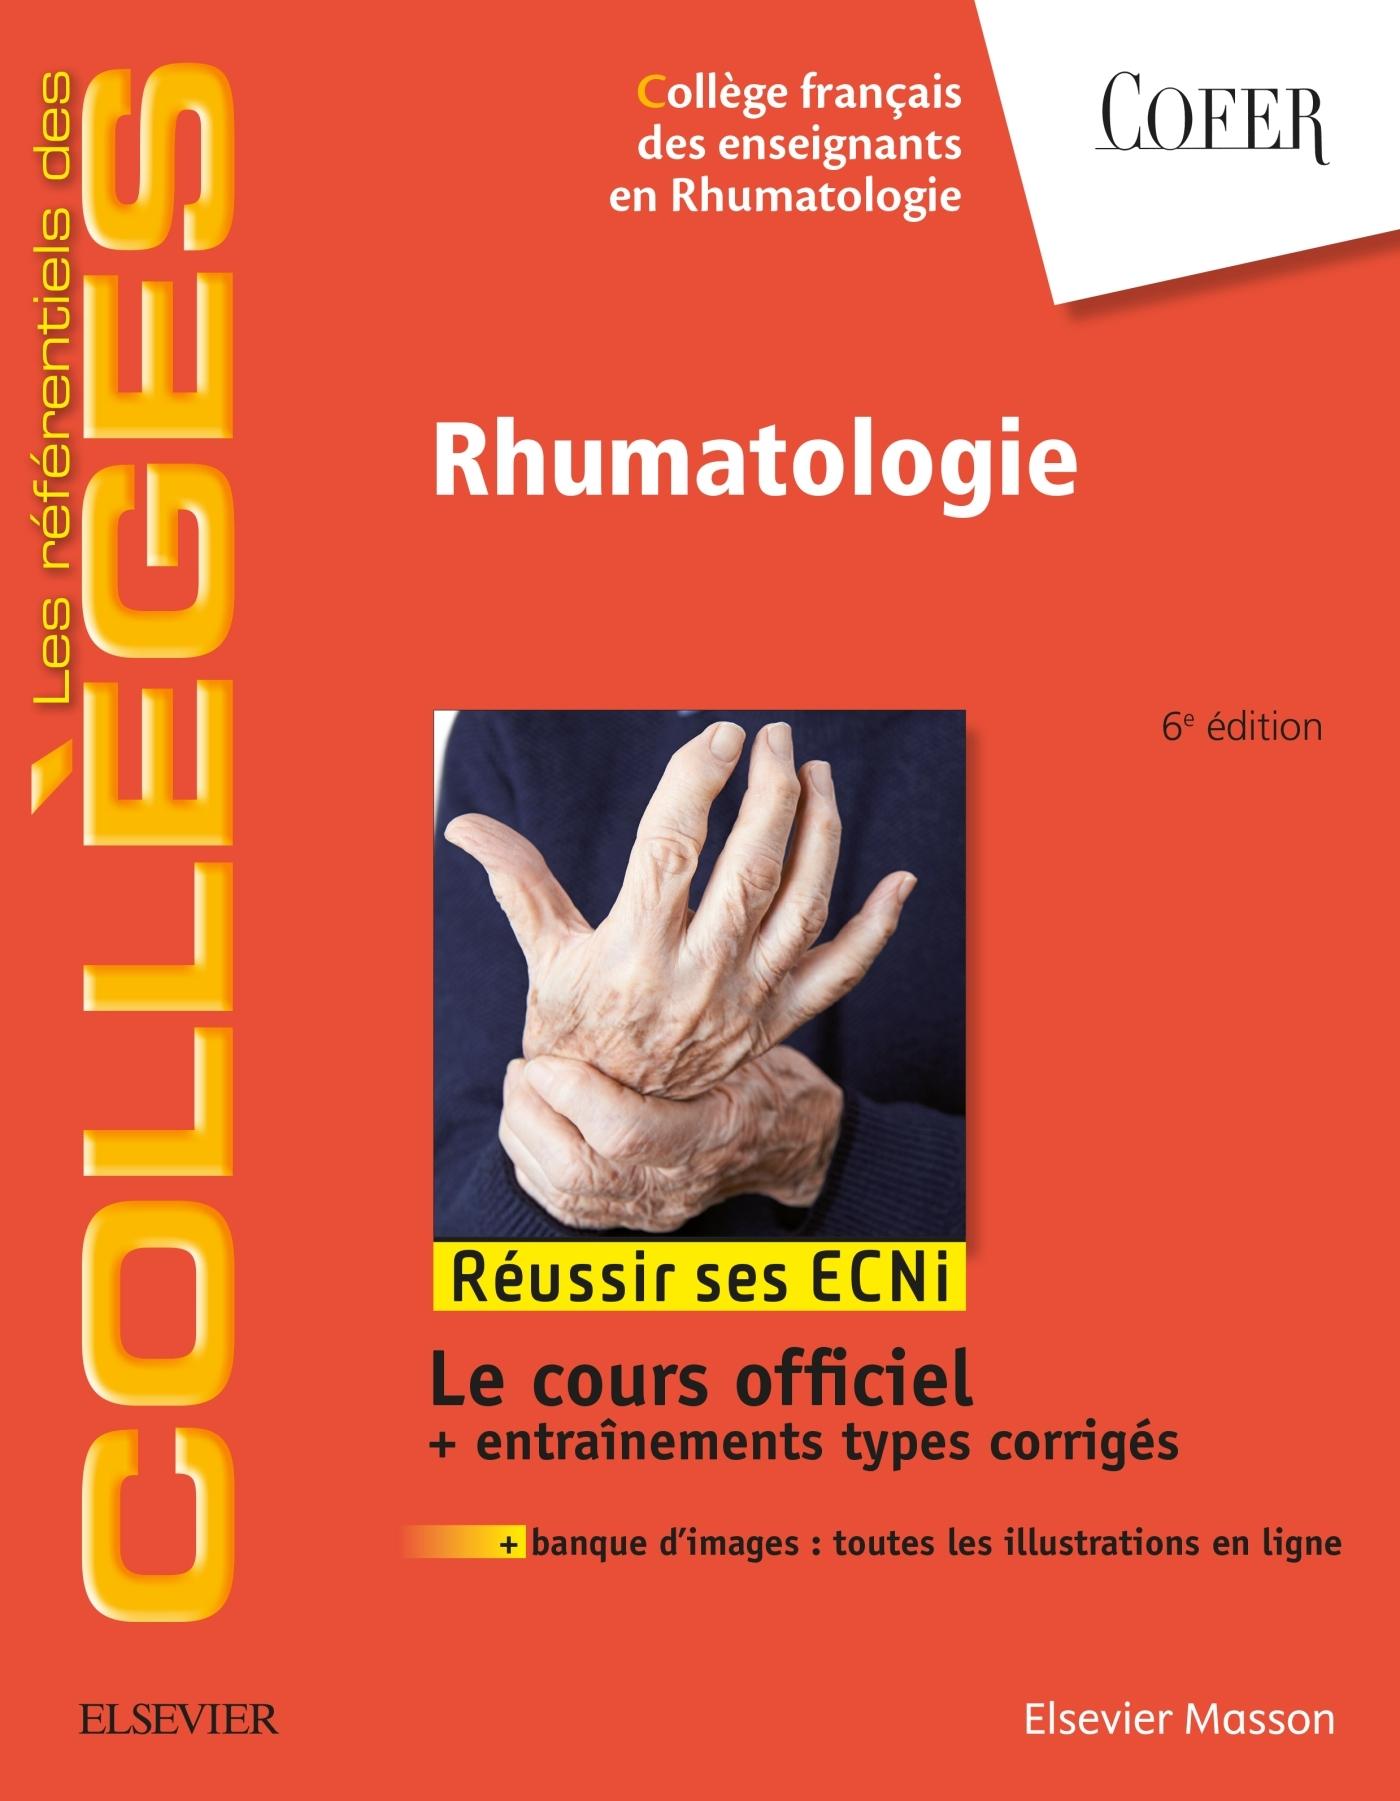 RHUMATOLOGIE - REUSSIR LES ECNI